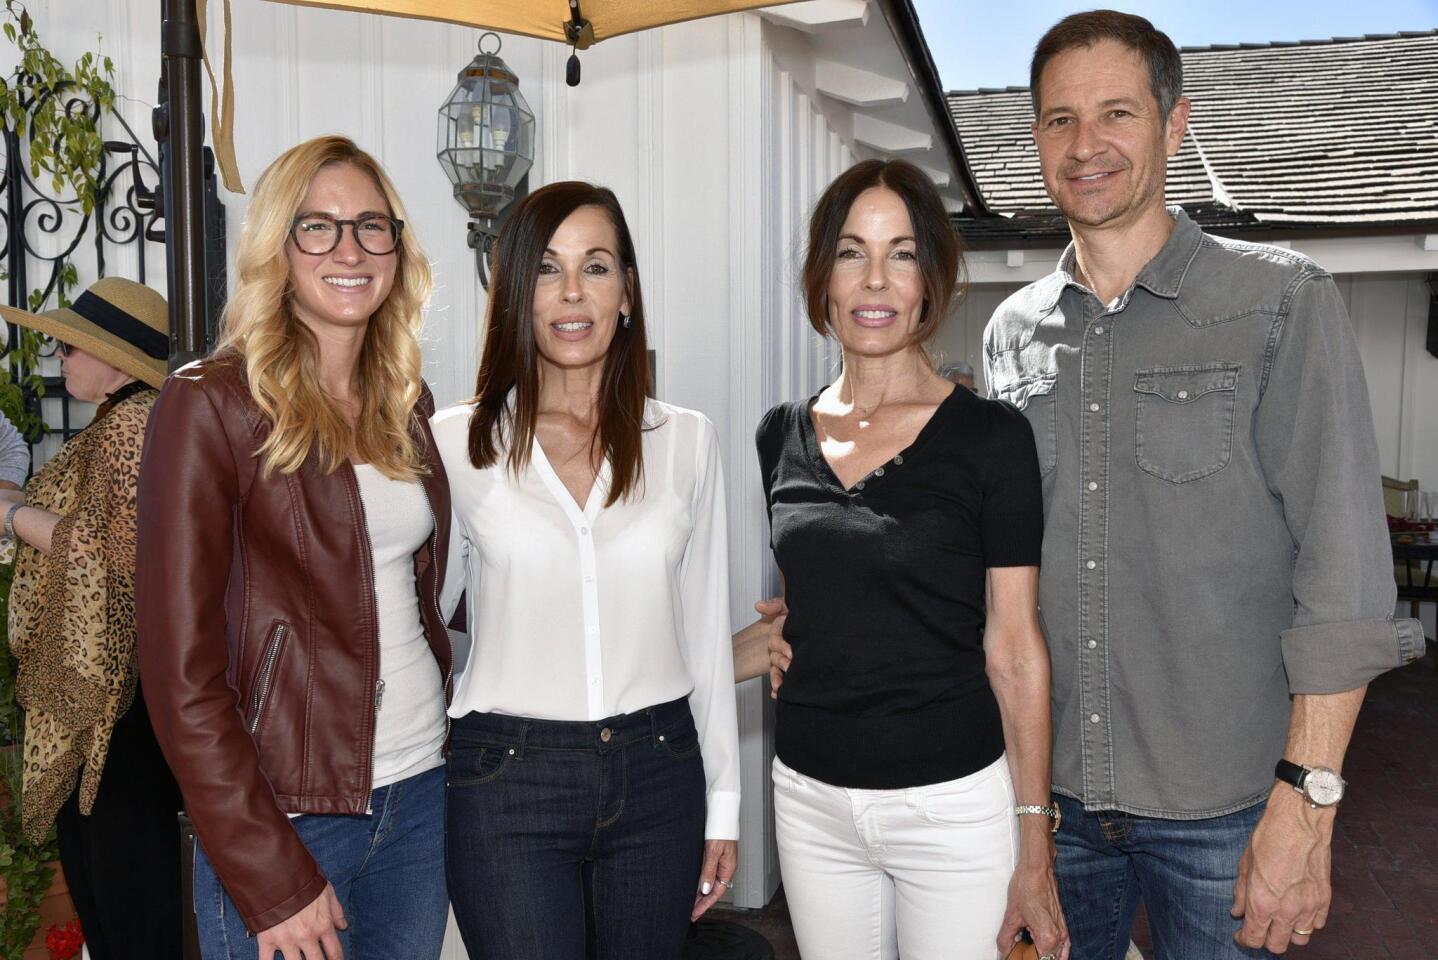 Meghan Parsons, Cheri Salyers, Terri and Charlie Chivetta